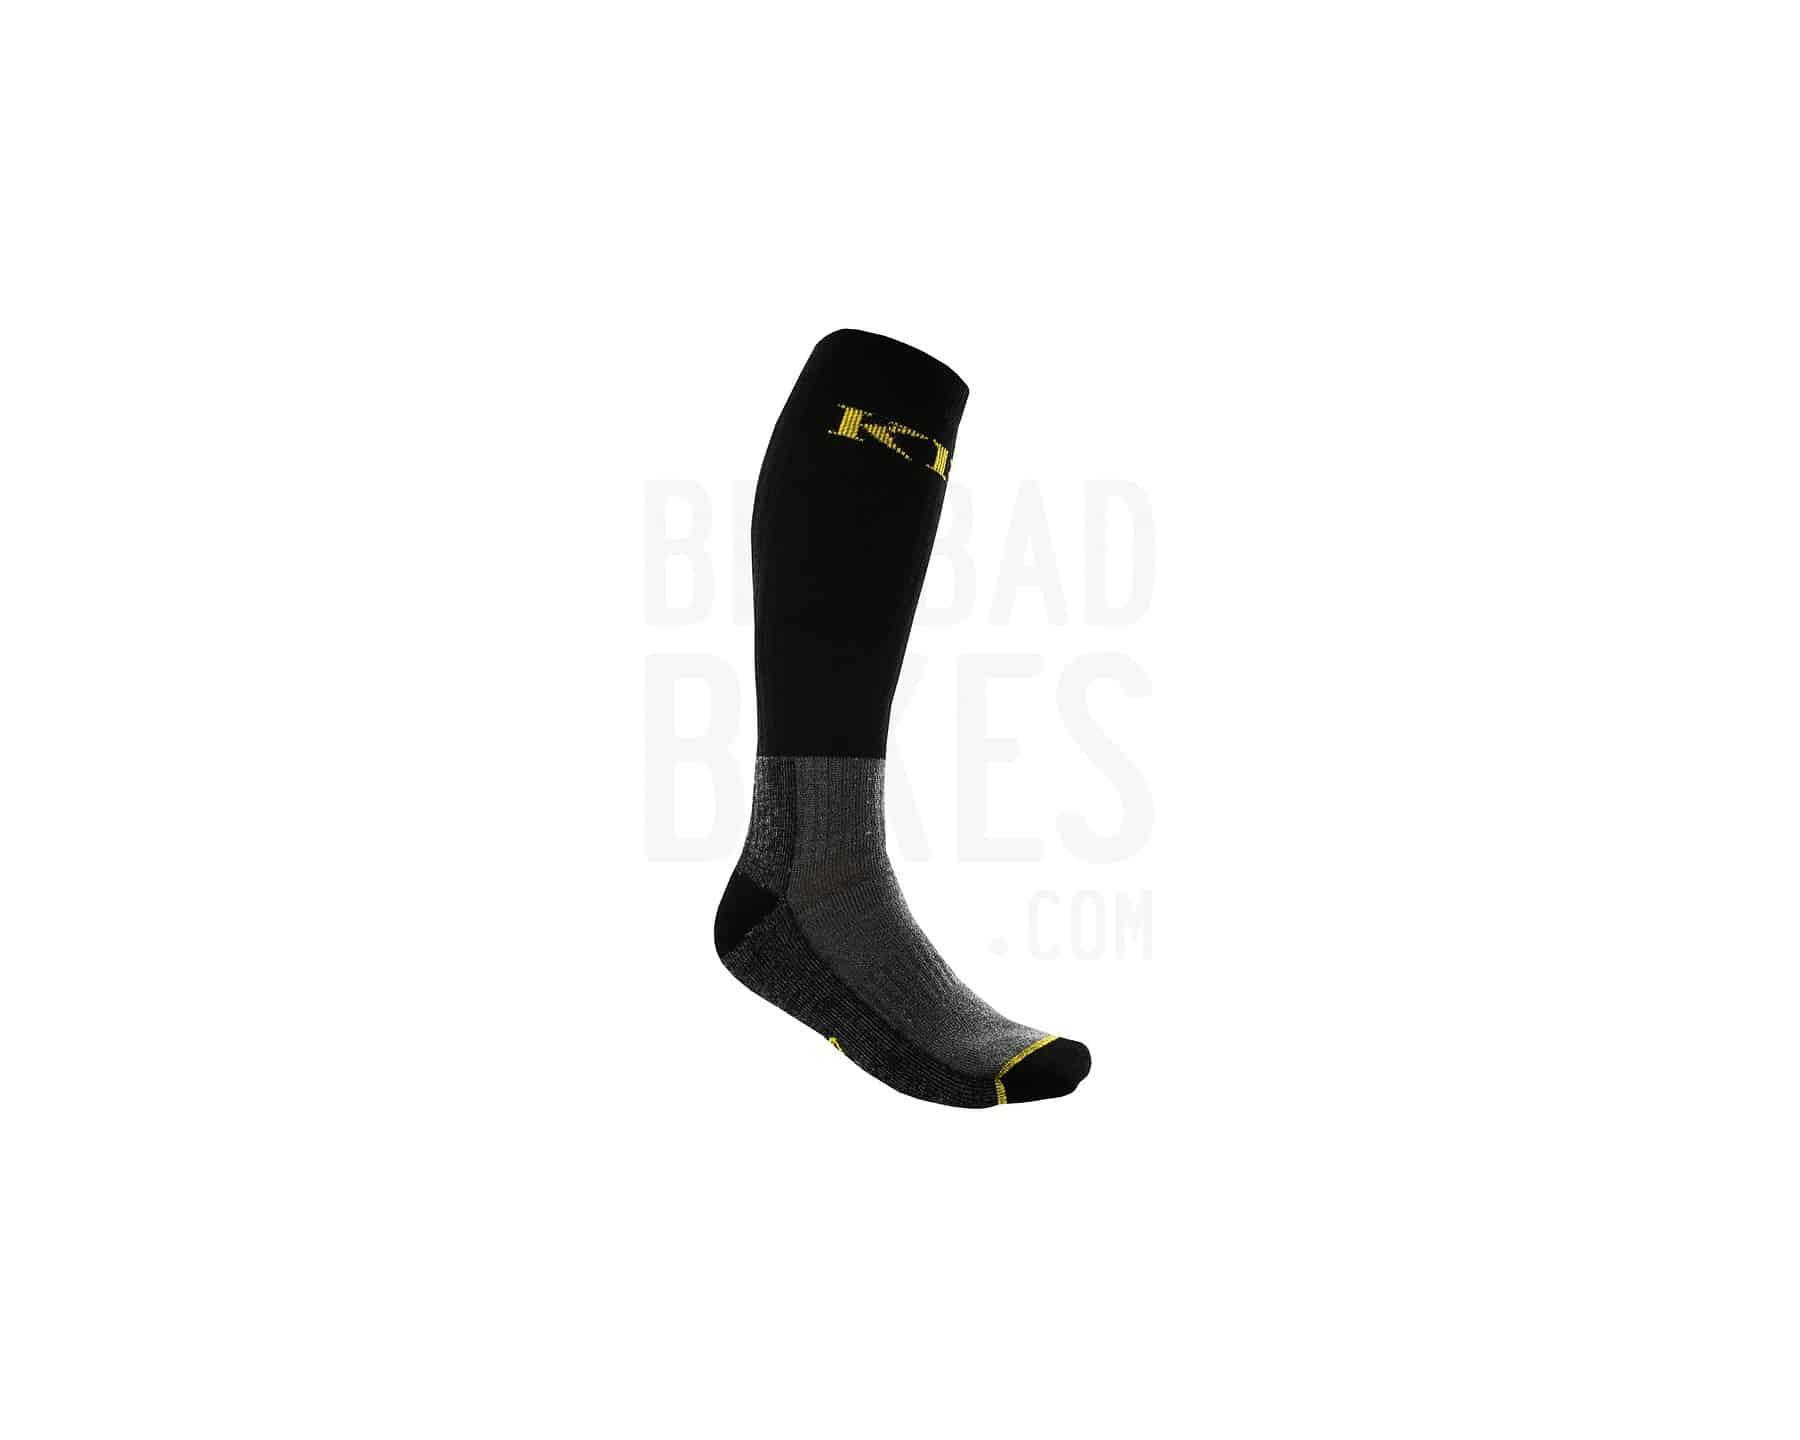 Mammoth Sock 6005-001-000